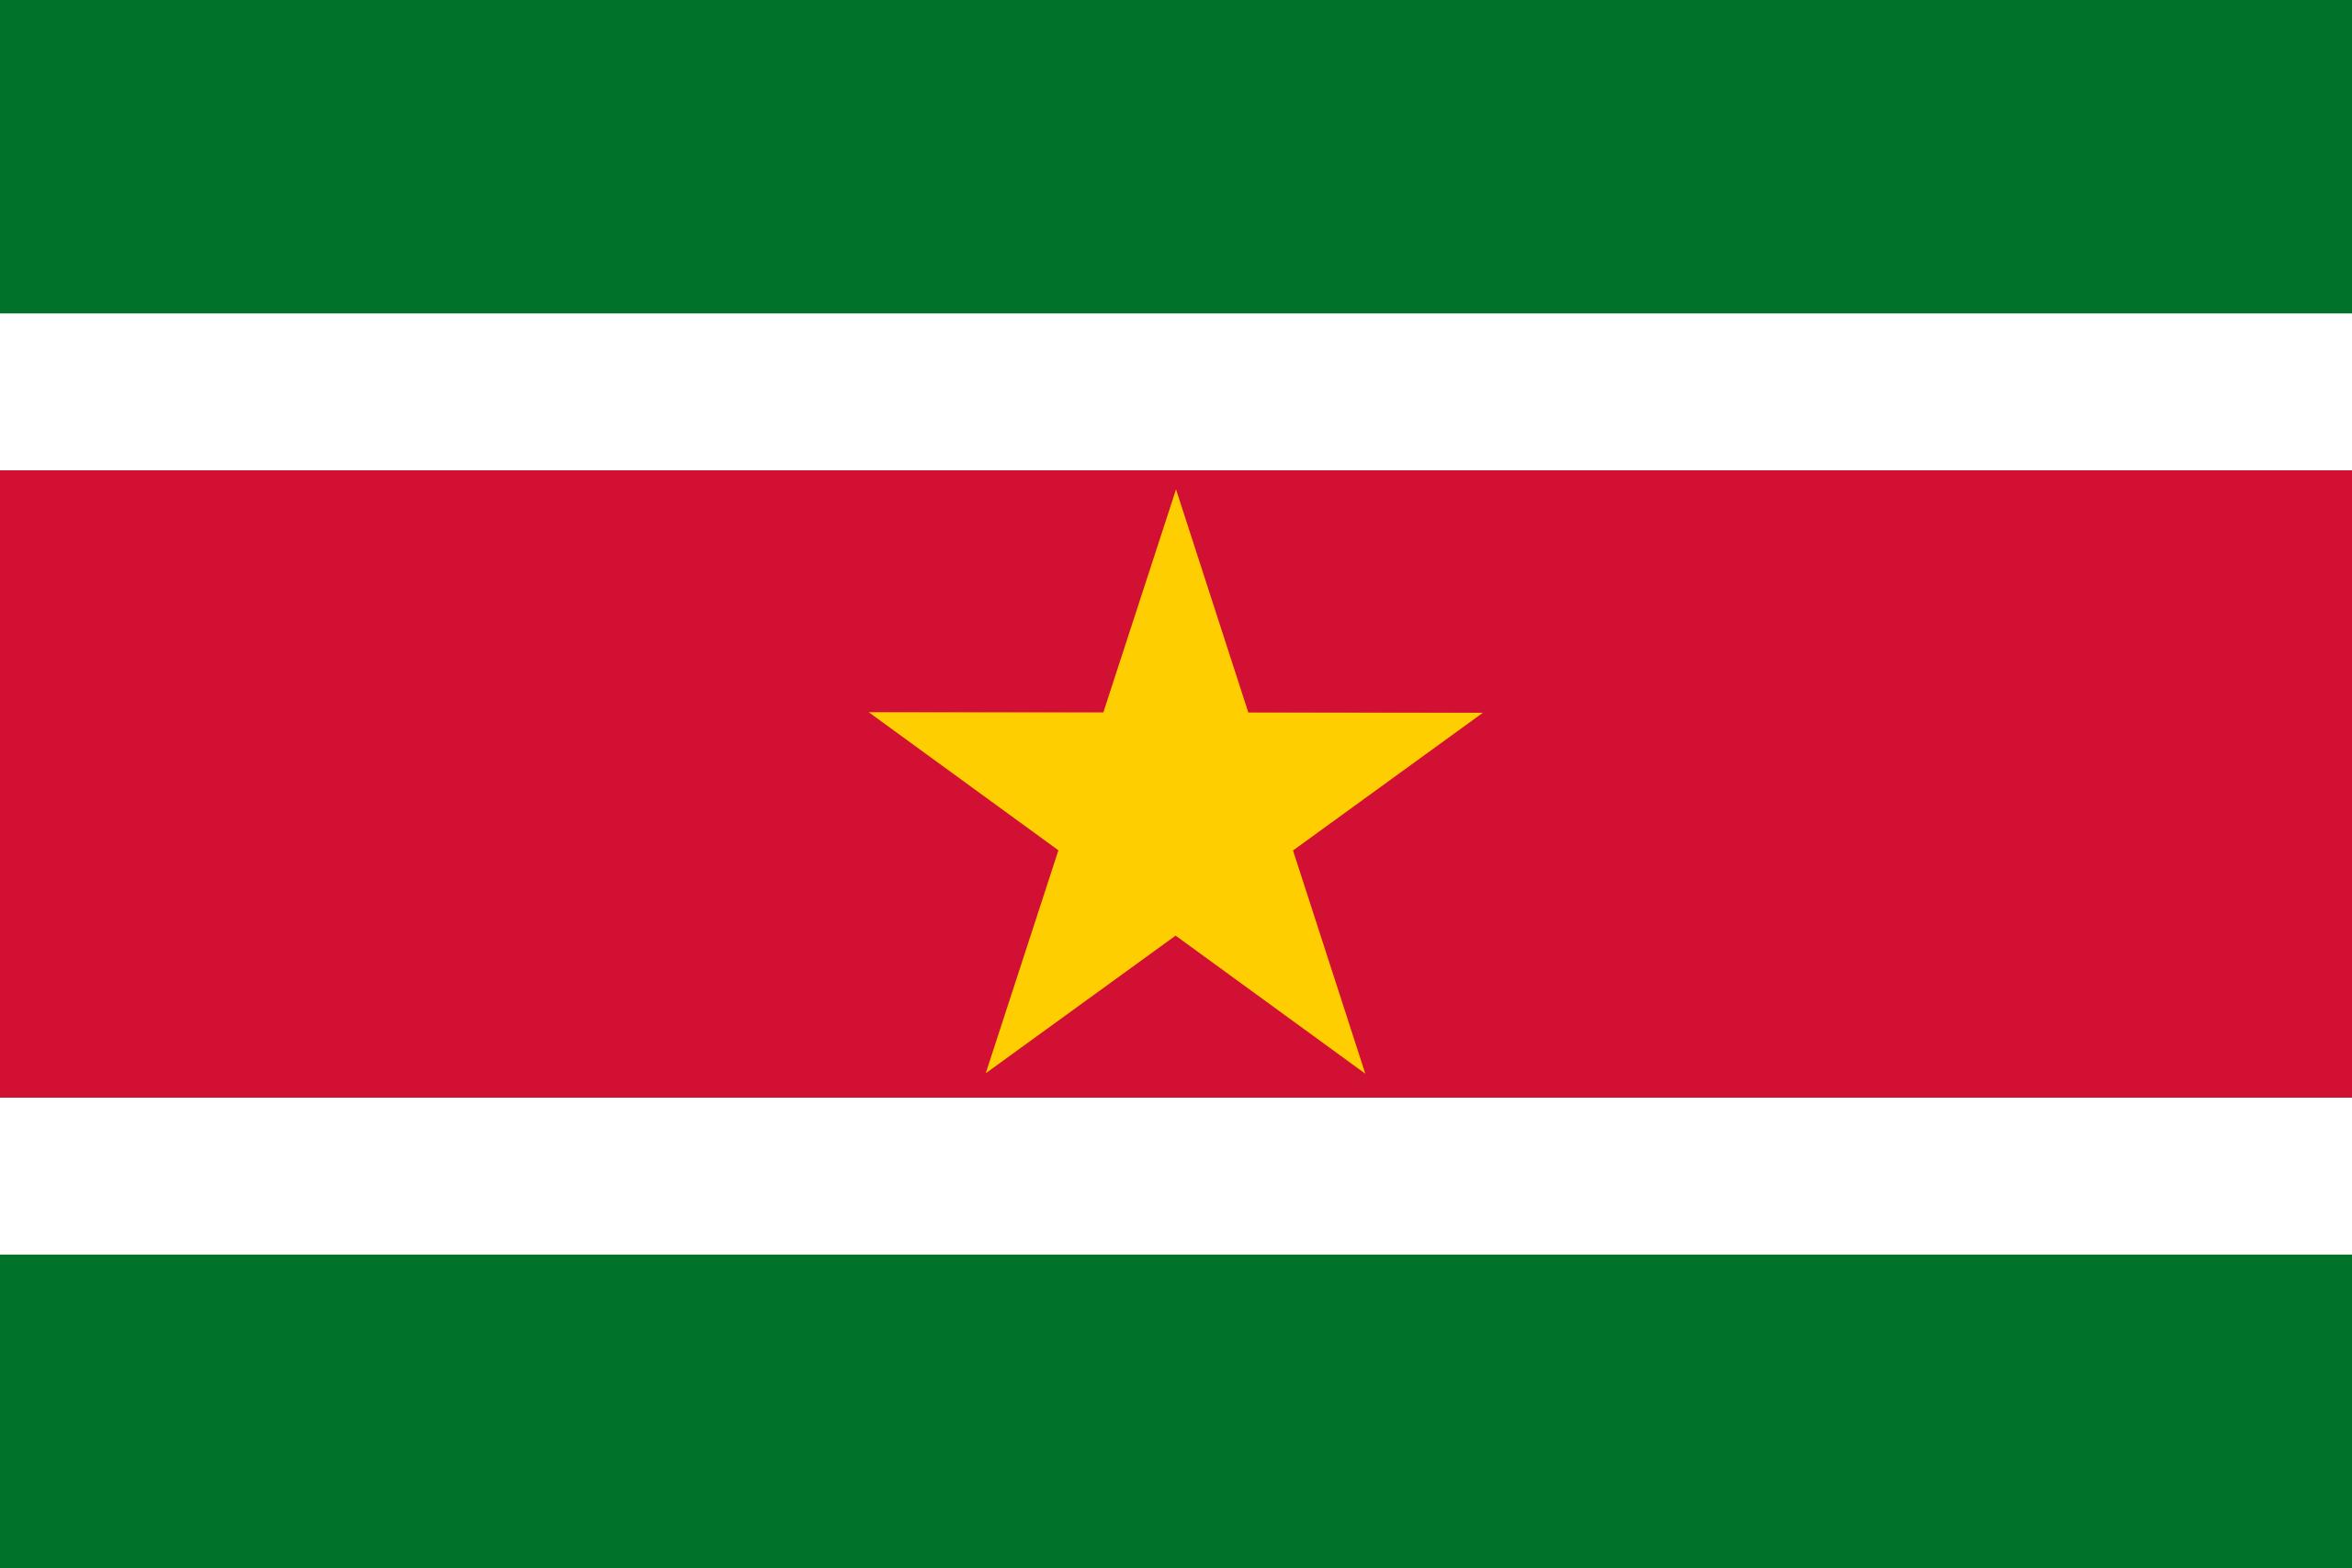 surinam, χώρα, έμβλημα, λογότυπο, σύμβολο - Wallpapers HD - Professor-falken.com